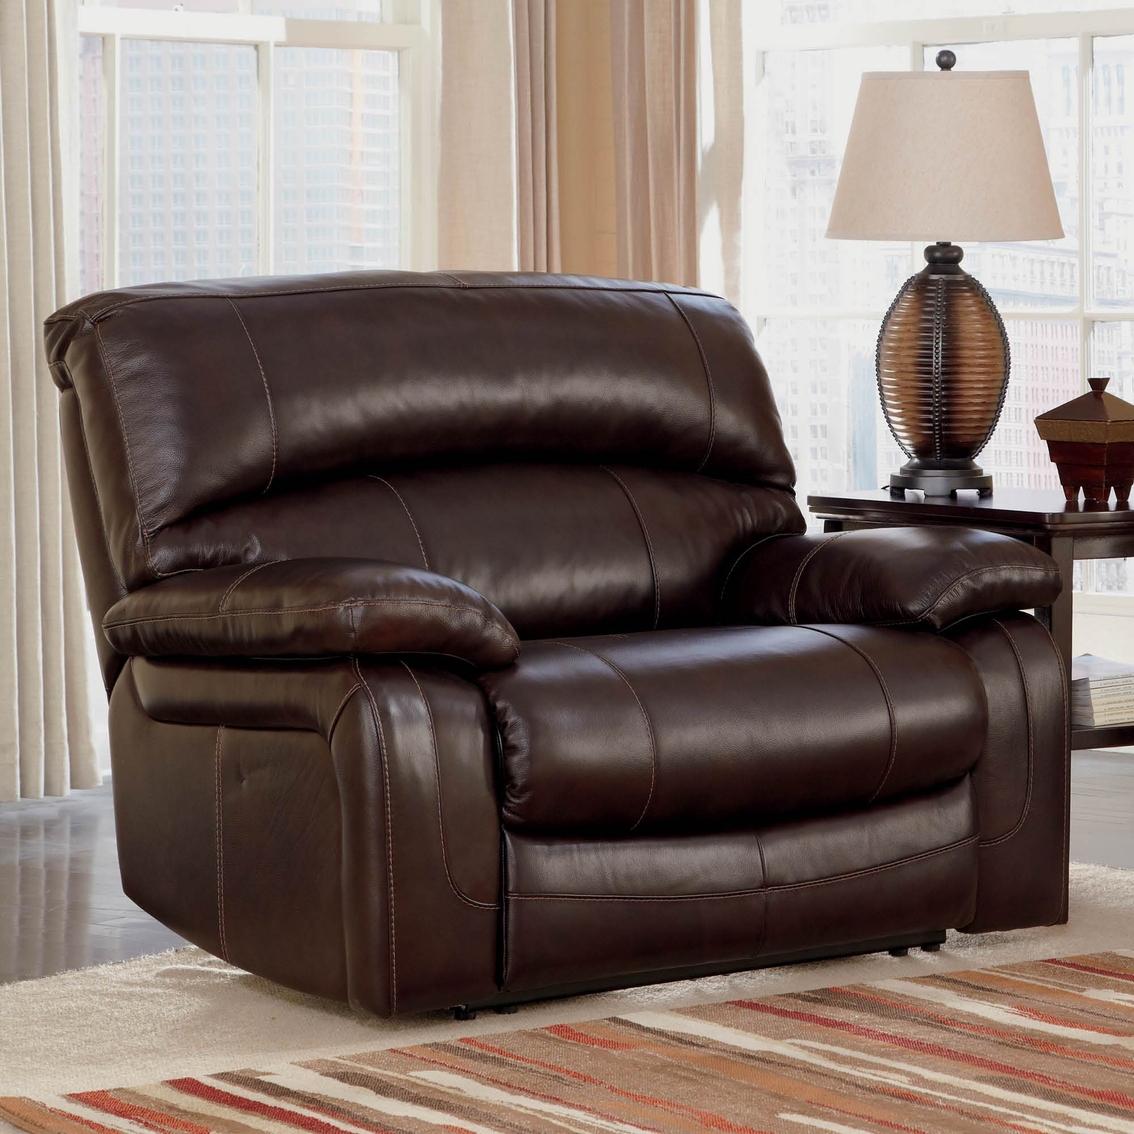 ashley oversized chair adjustable height kids damacio power recliner chairs